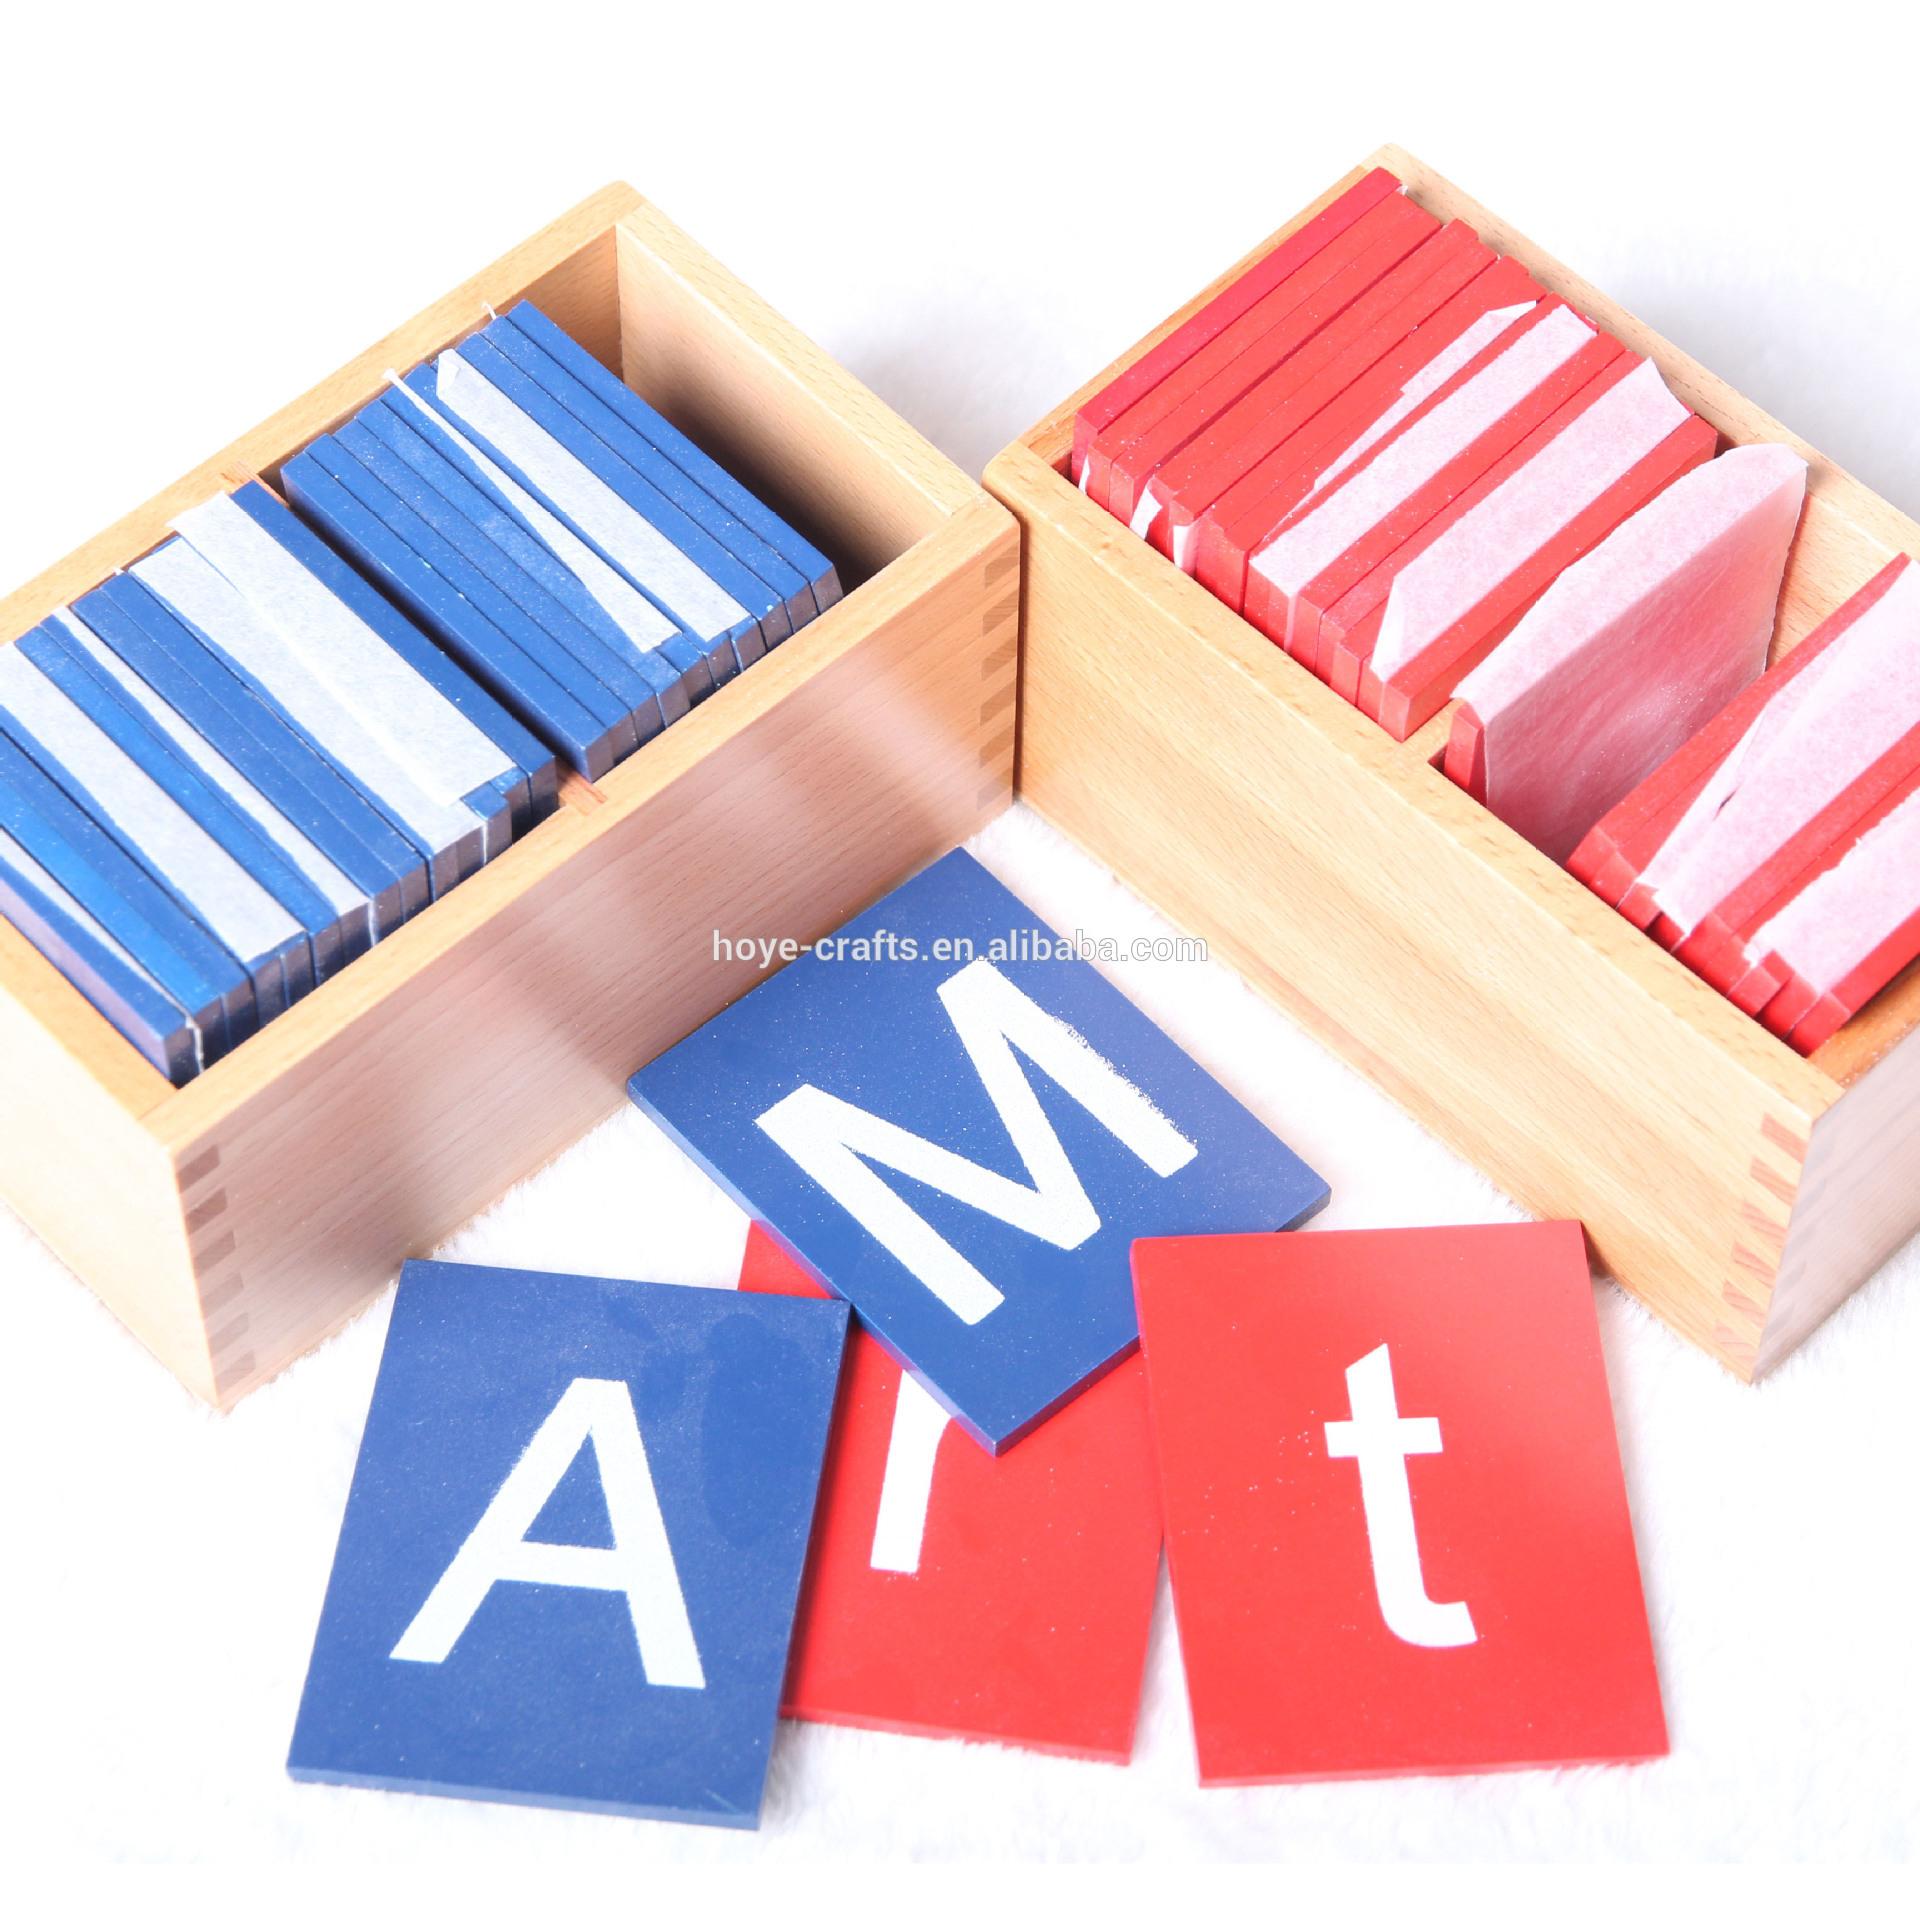 Montessori Language Toys Print Tracing Board Sandpaper Letters - Buy  Educational Toy,sandpaper Letters,print Tracing Board Product On Alibaba regarding Tracing Sandpaper Letters